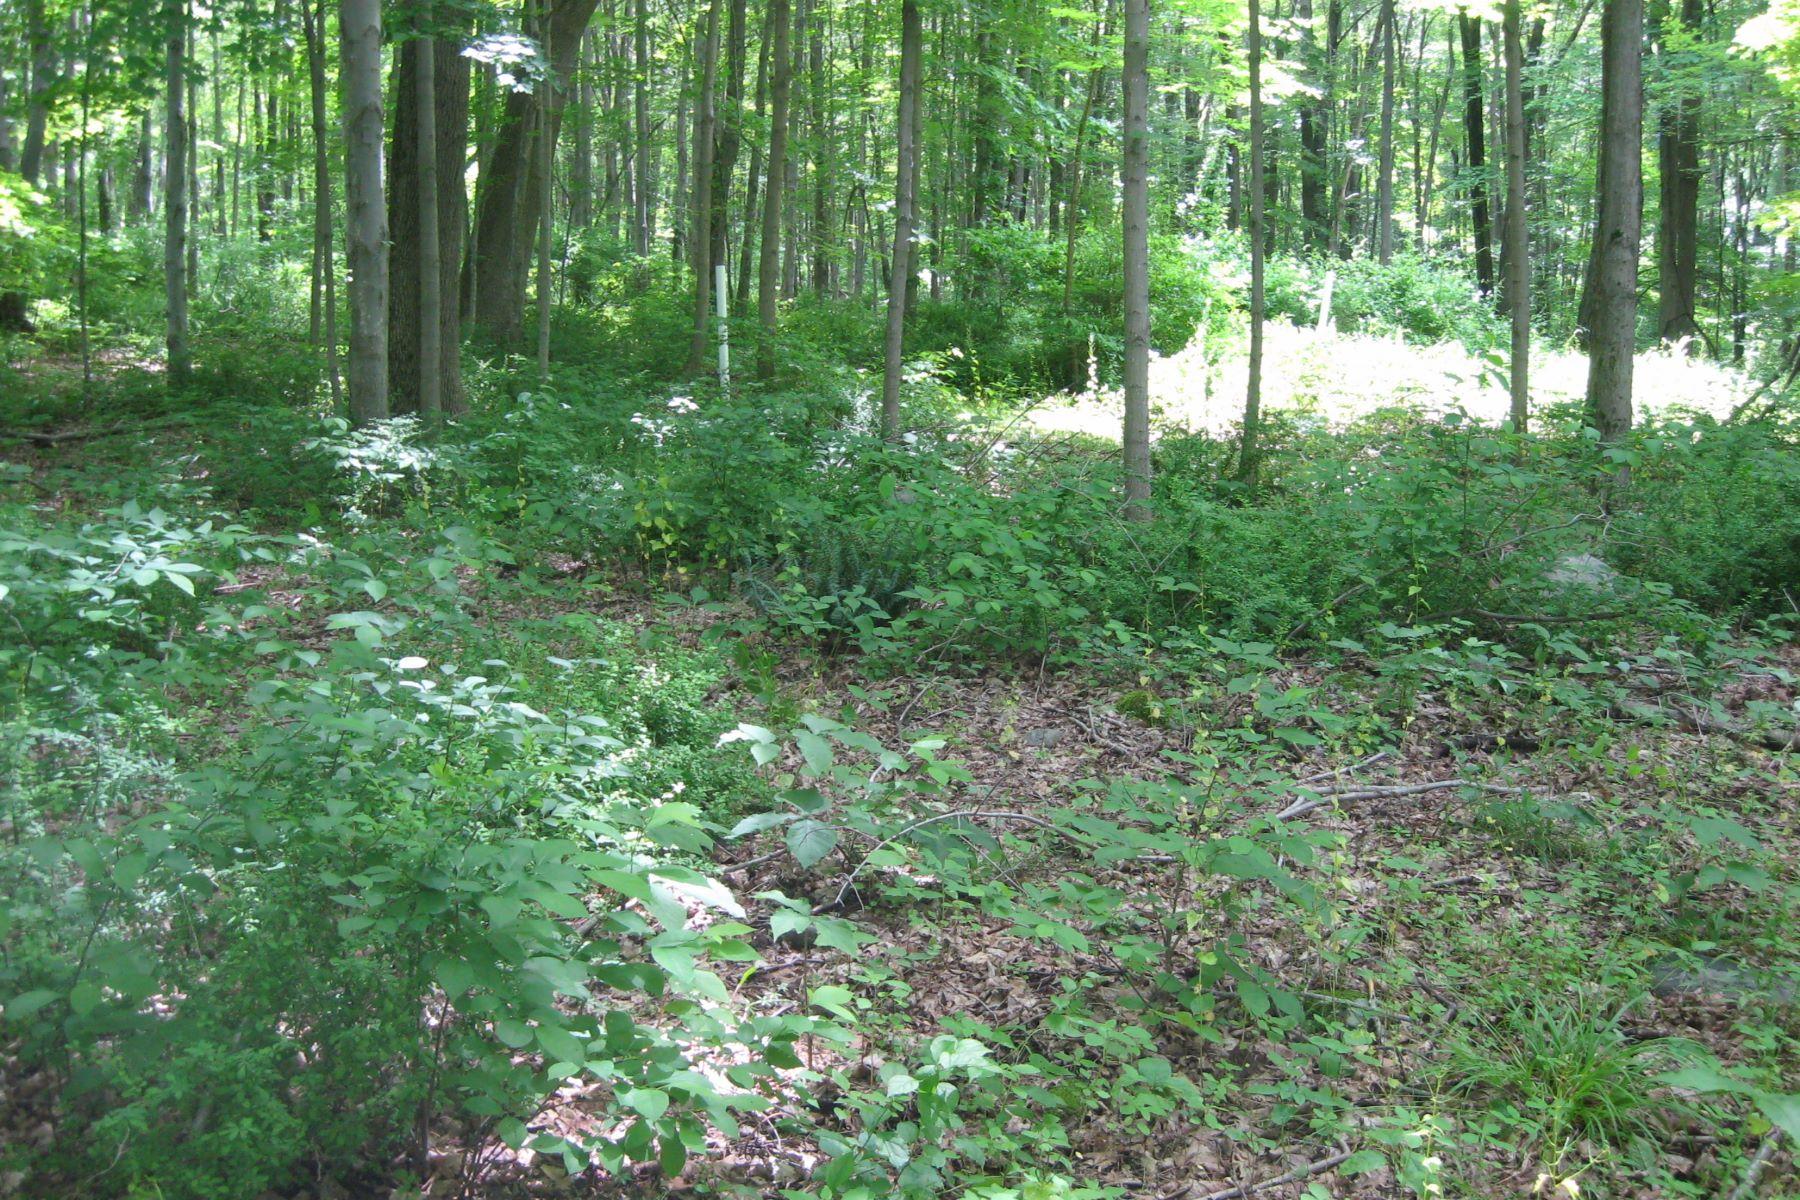 Đất đai vì Bán tại Candlewood Terrace Lake Community 00 Juniper Drive, New Milford, Connecticut, 06776 Hoa Kỳ